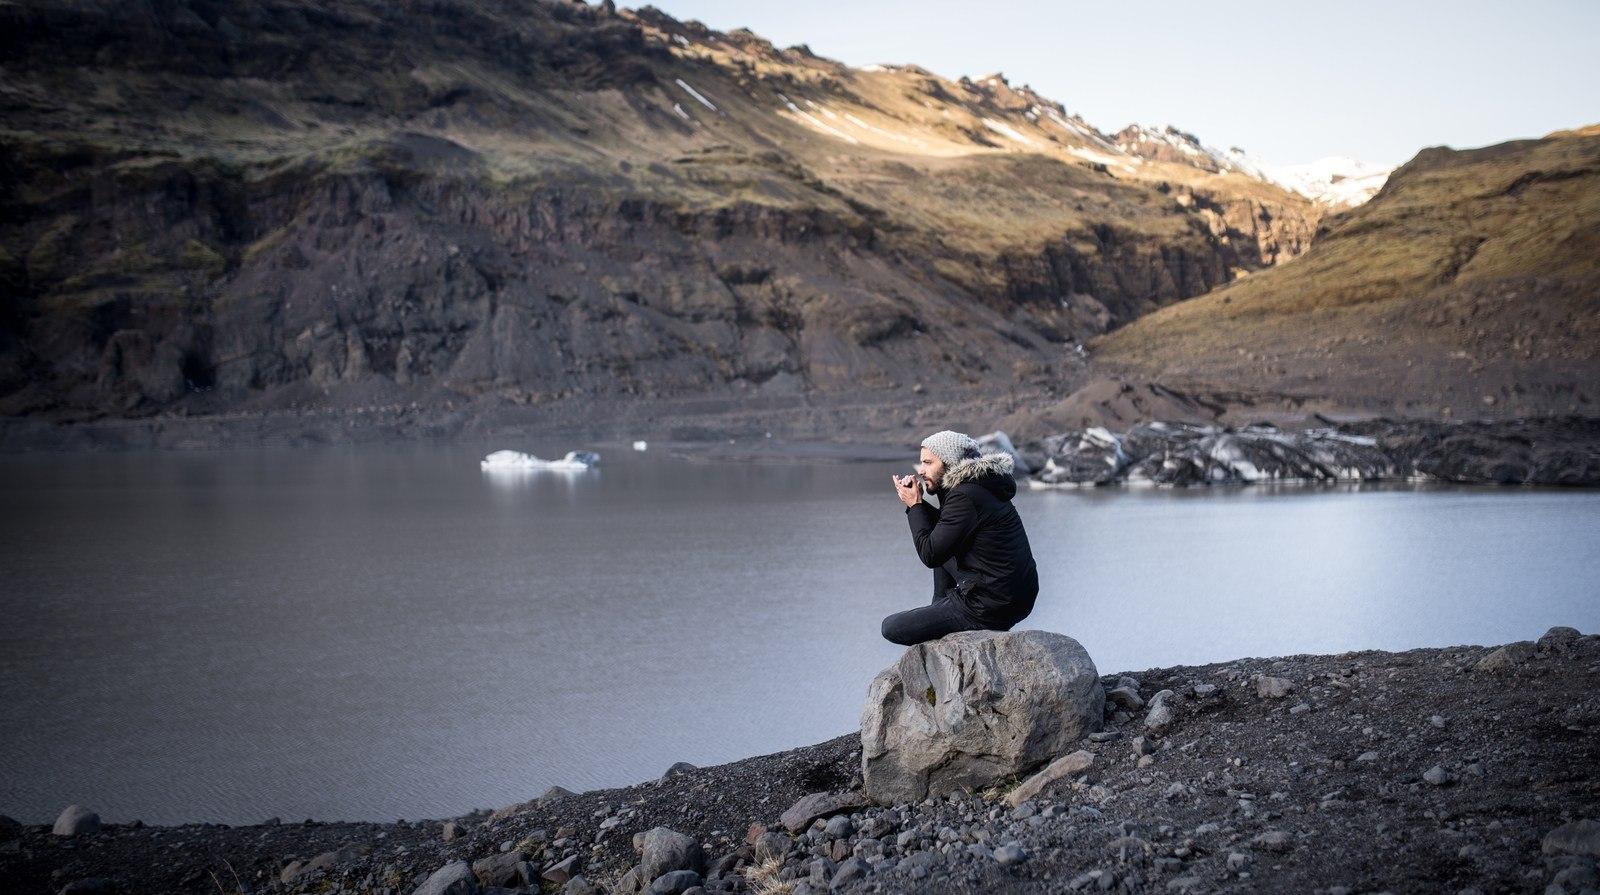 Seb (qui a froid) Sólheimajökull